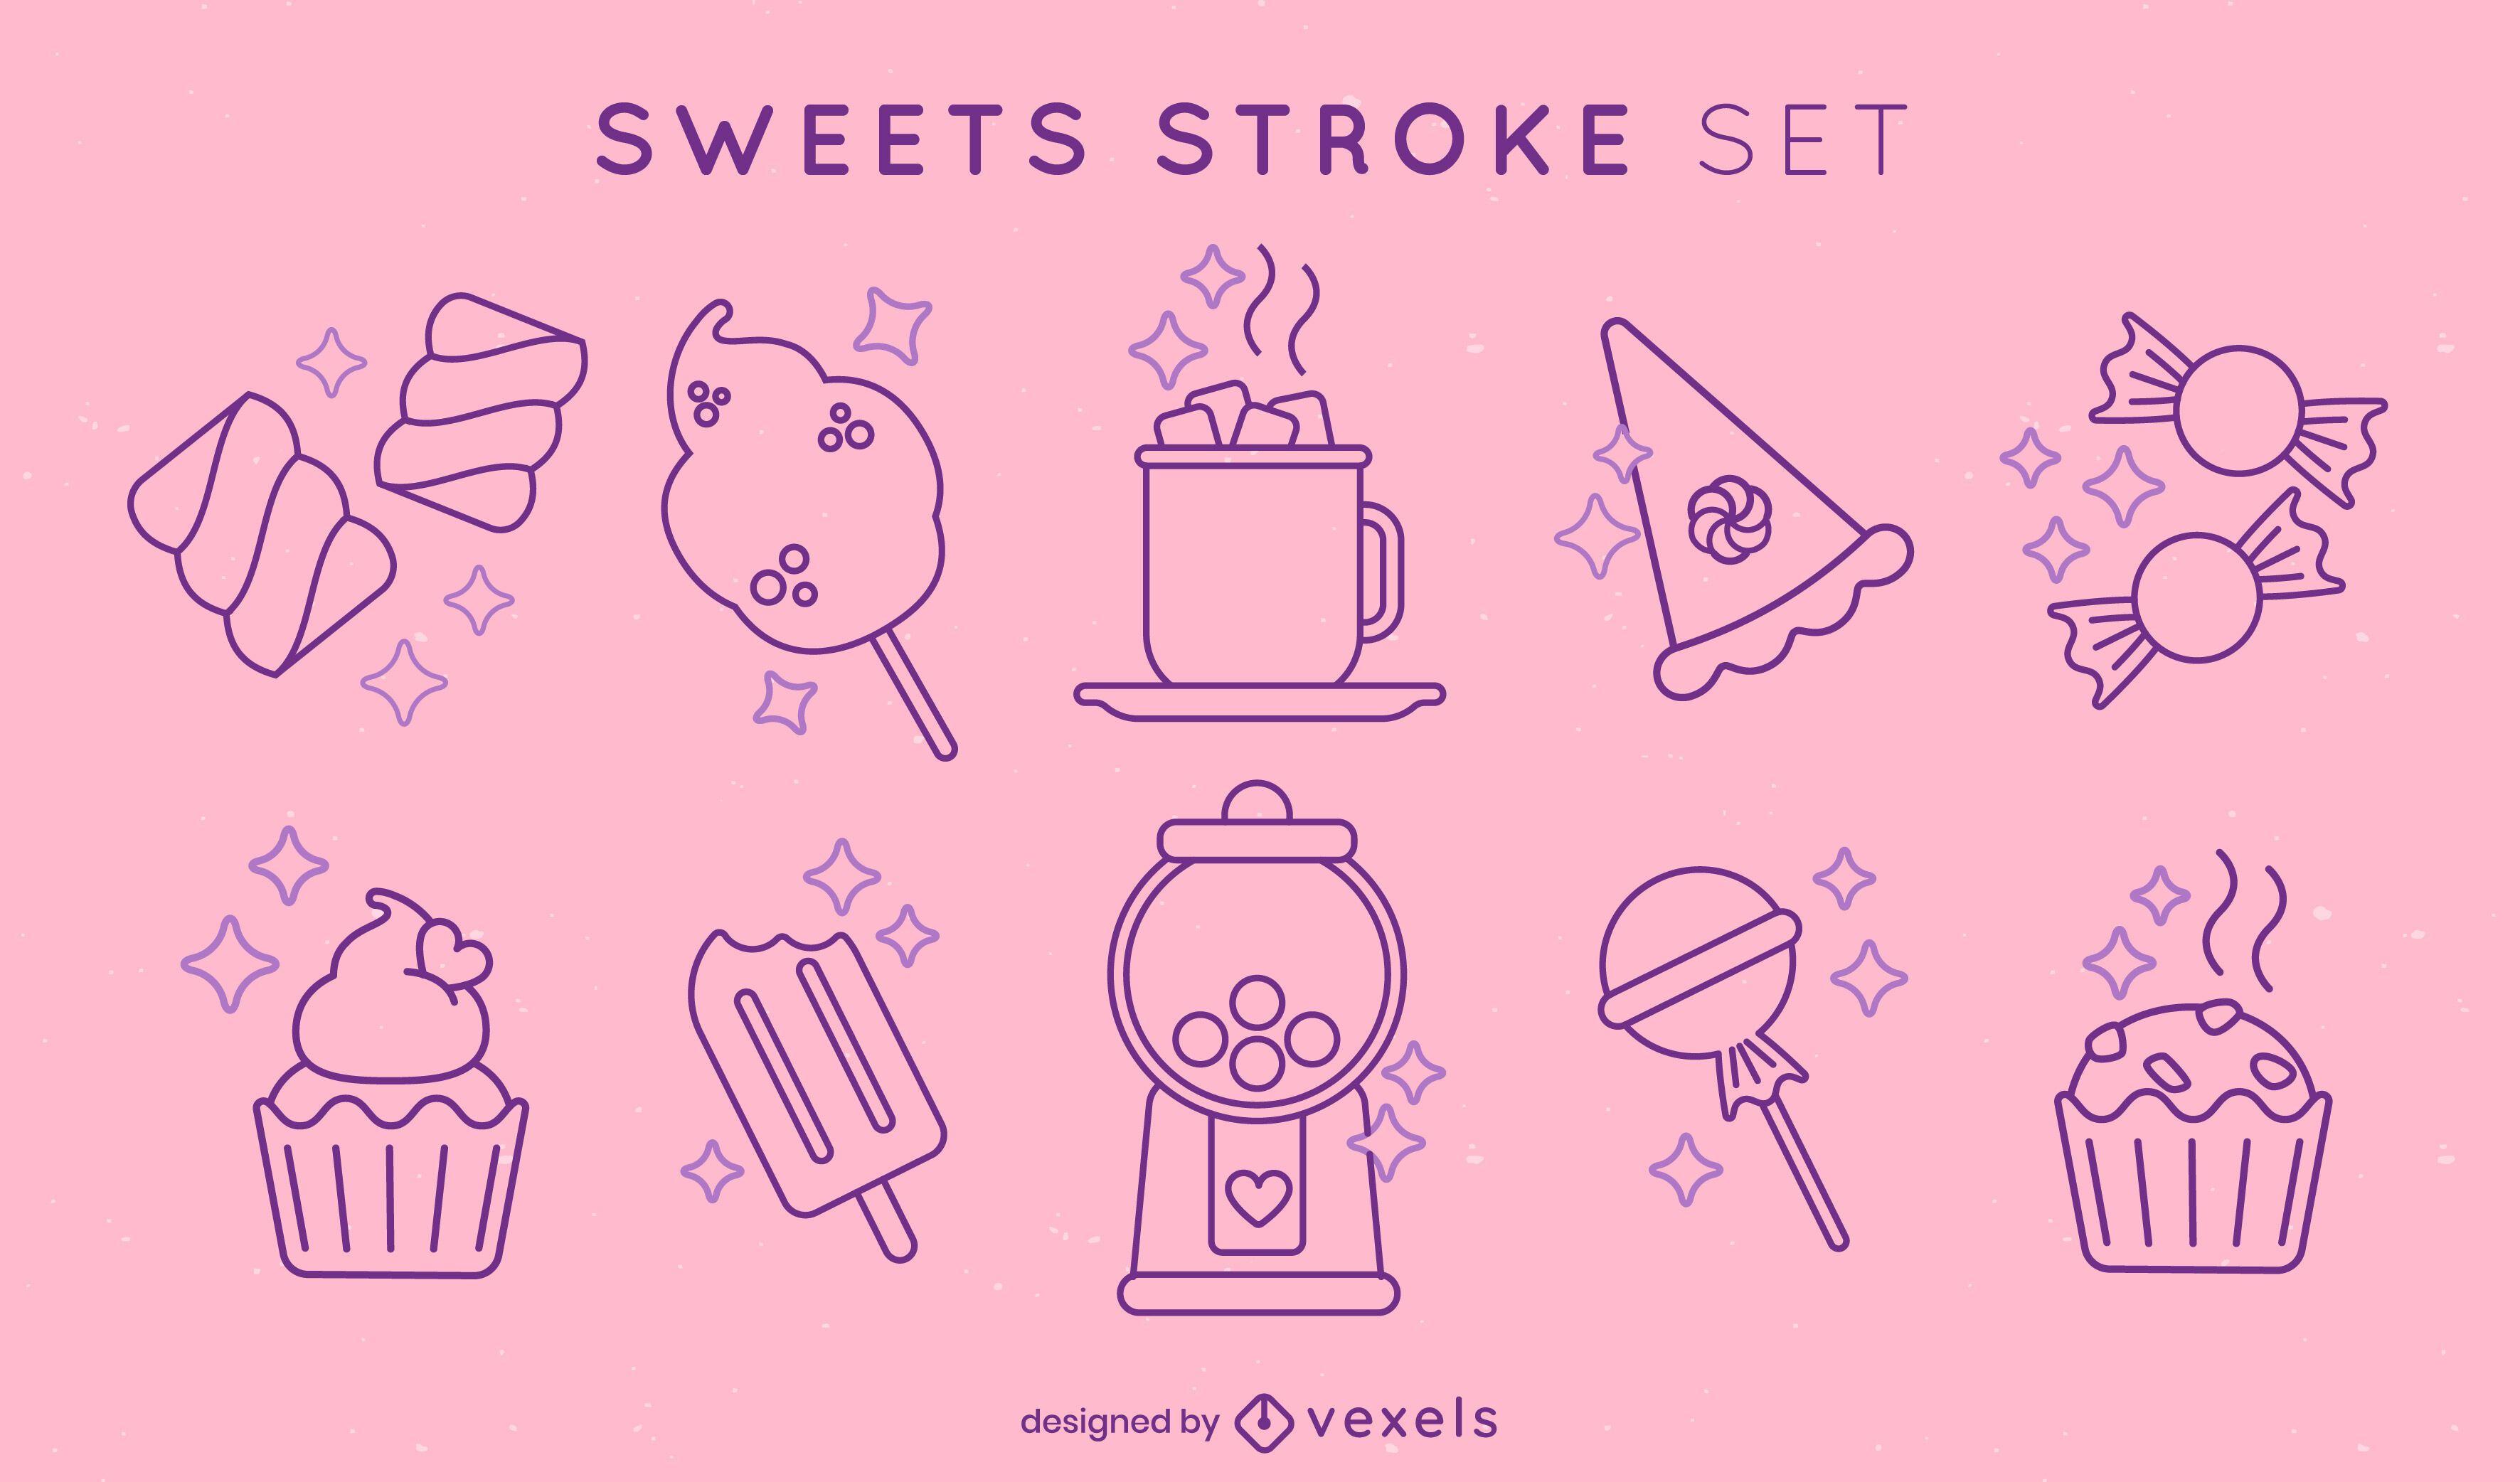 Conjunto de elementos de traço de alimentos doces e sobremesas